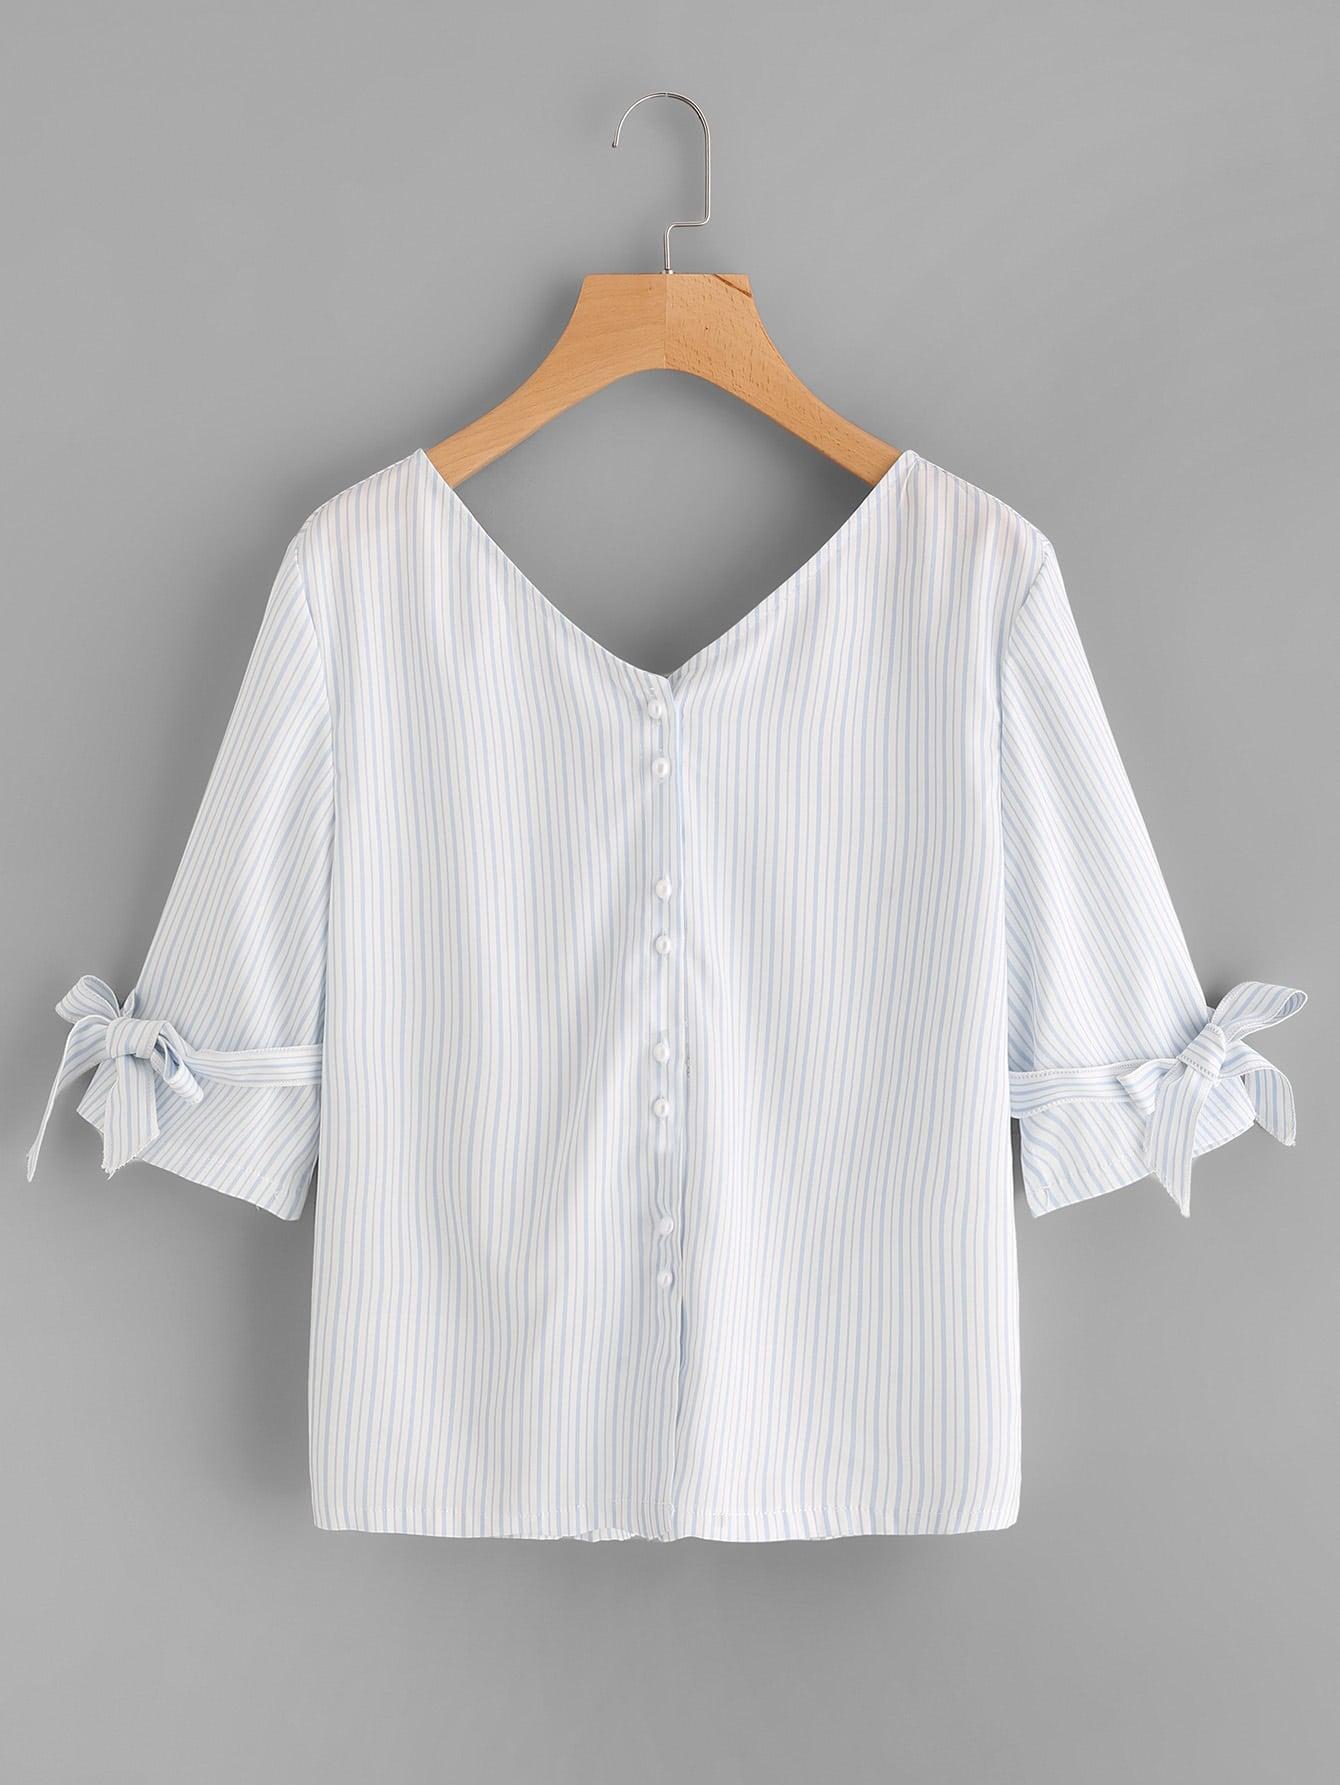 Double V-neckline Bow Tie Back Blouse bow sleeve v neckline blouse